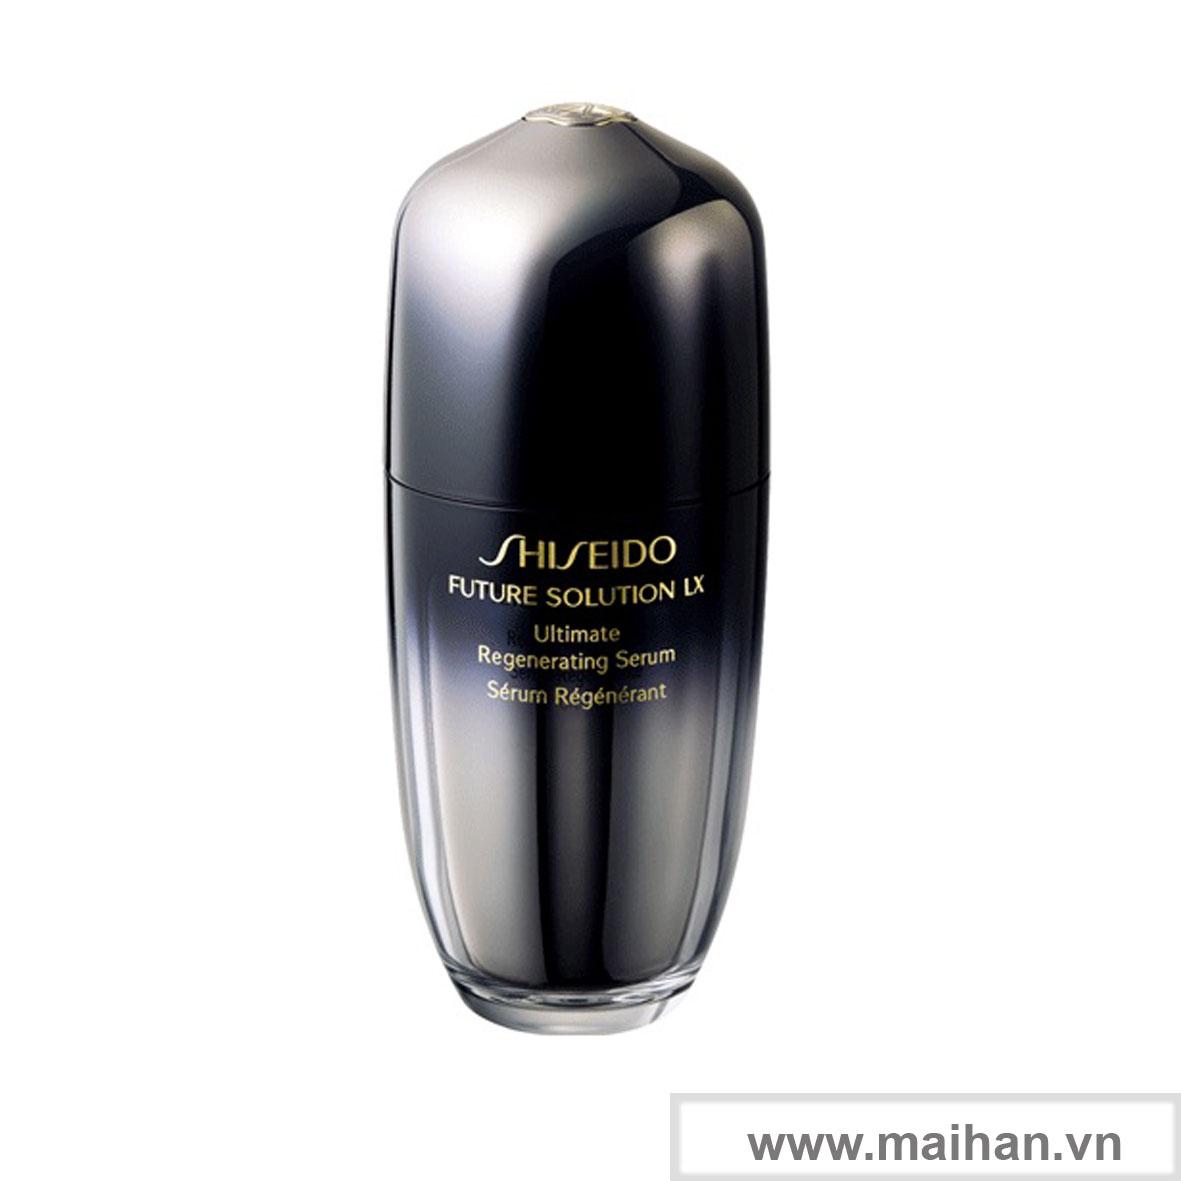 Tinh chất cao cấp Shiseido Ultimate Regenerating Serum